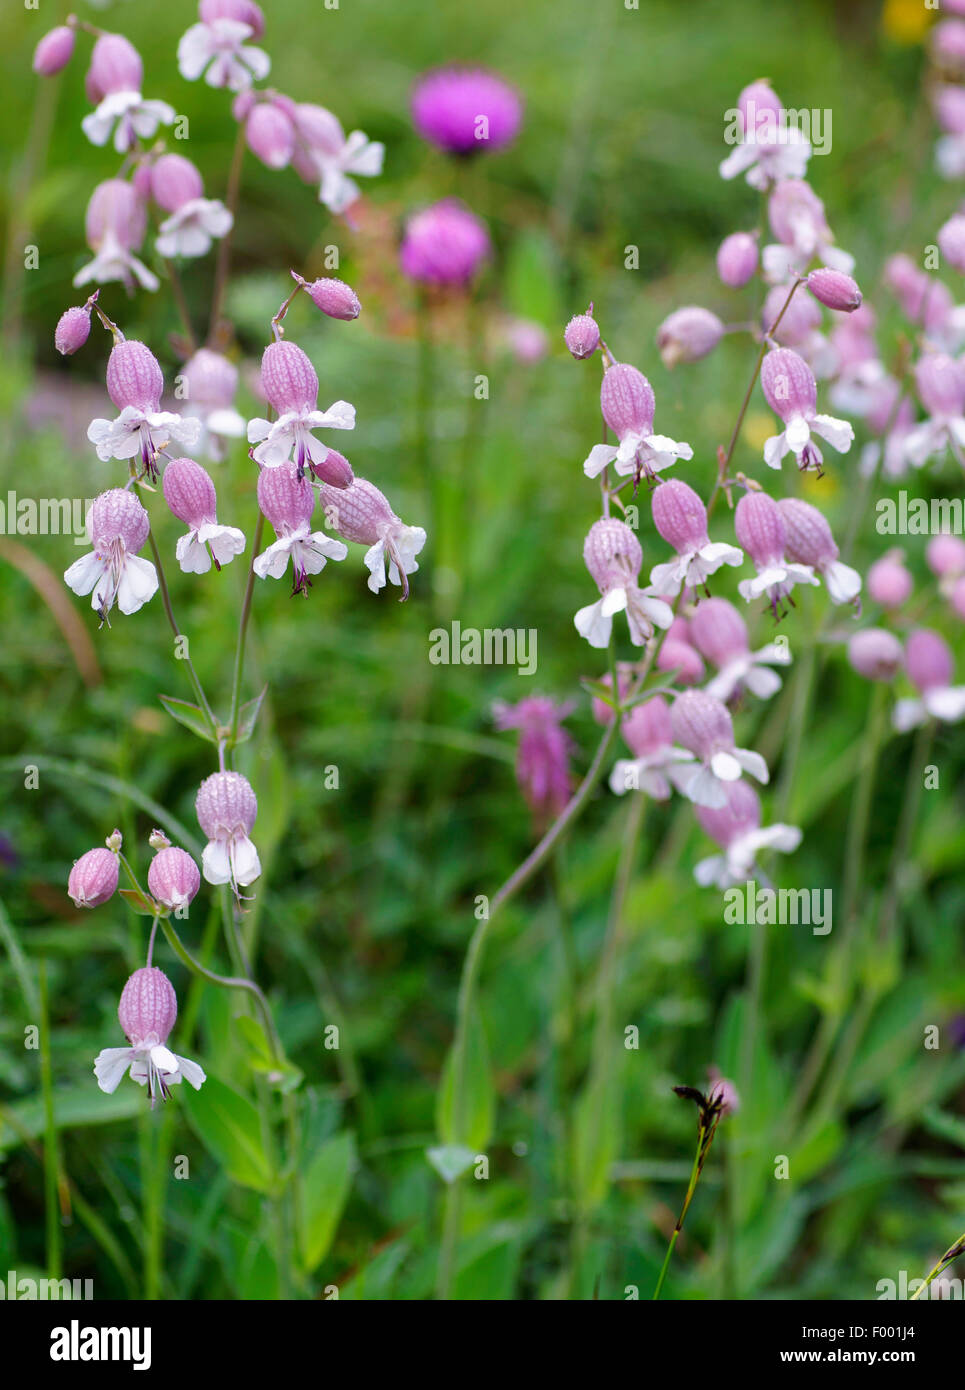 bladder campion, maiden's tears (Silene vulgaris), blooming, Austria, Tyrol, Lechtaler Alpen - Stock Image